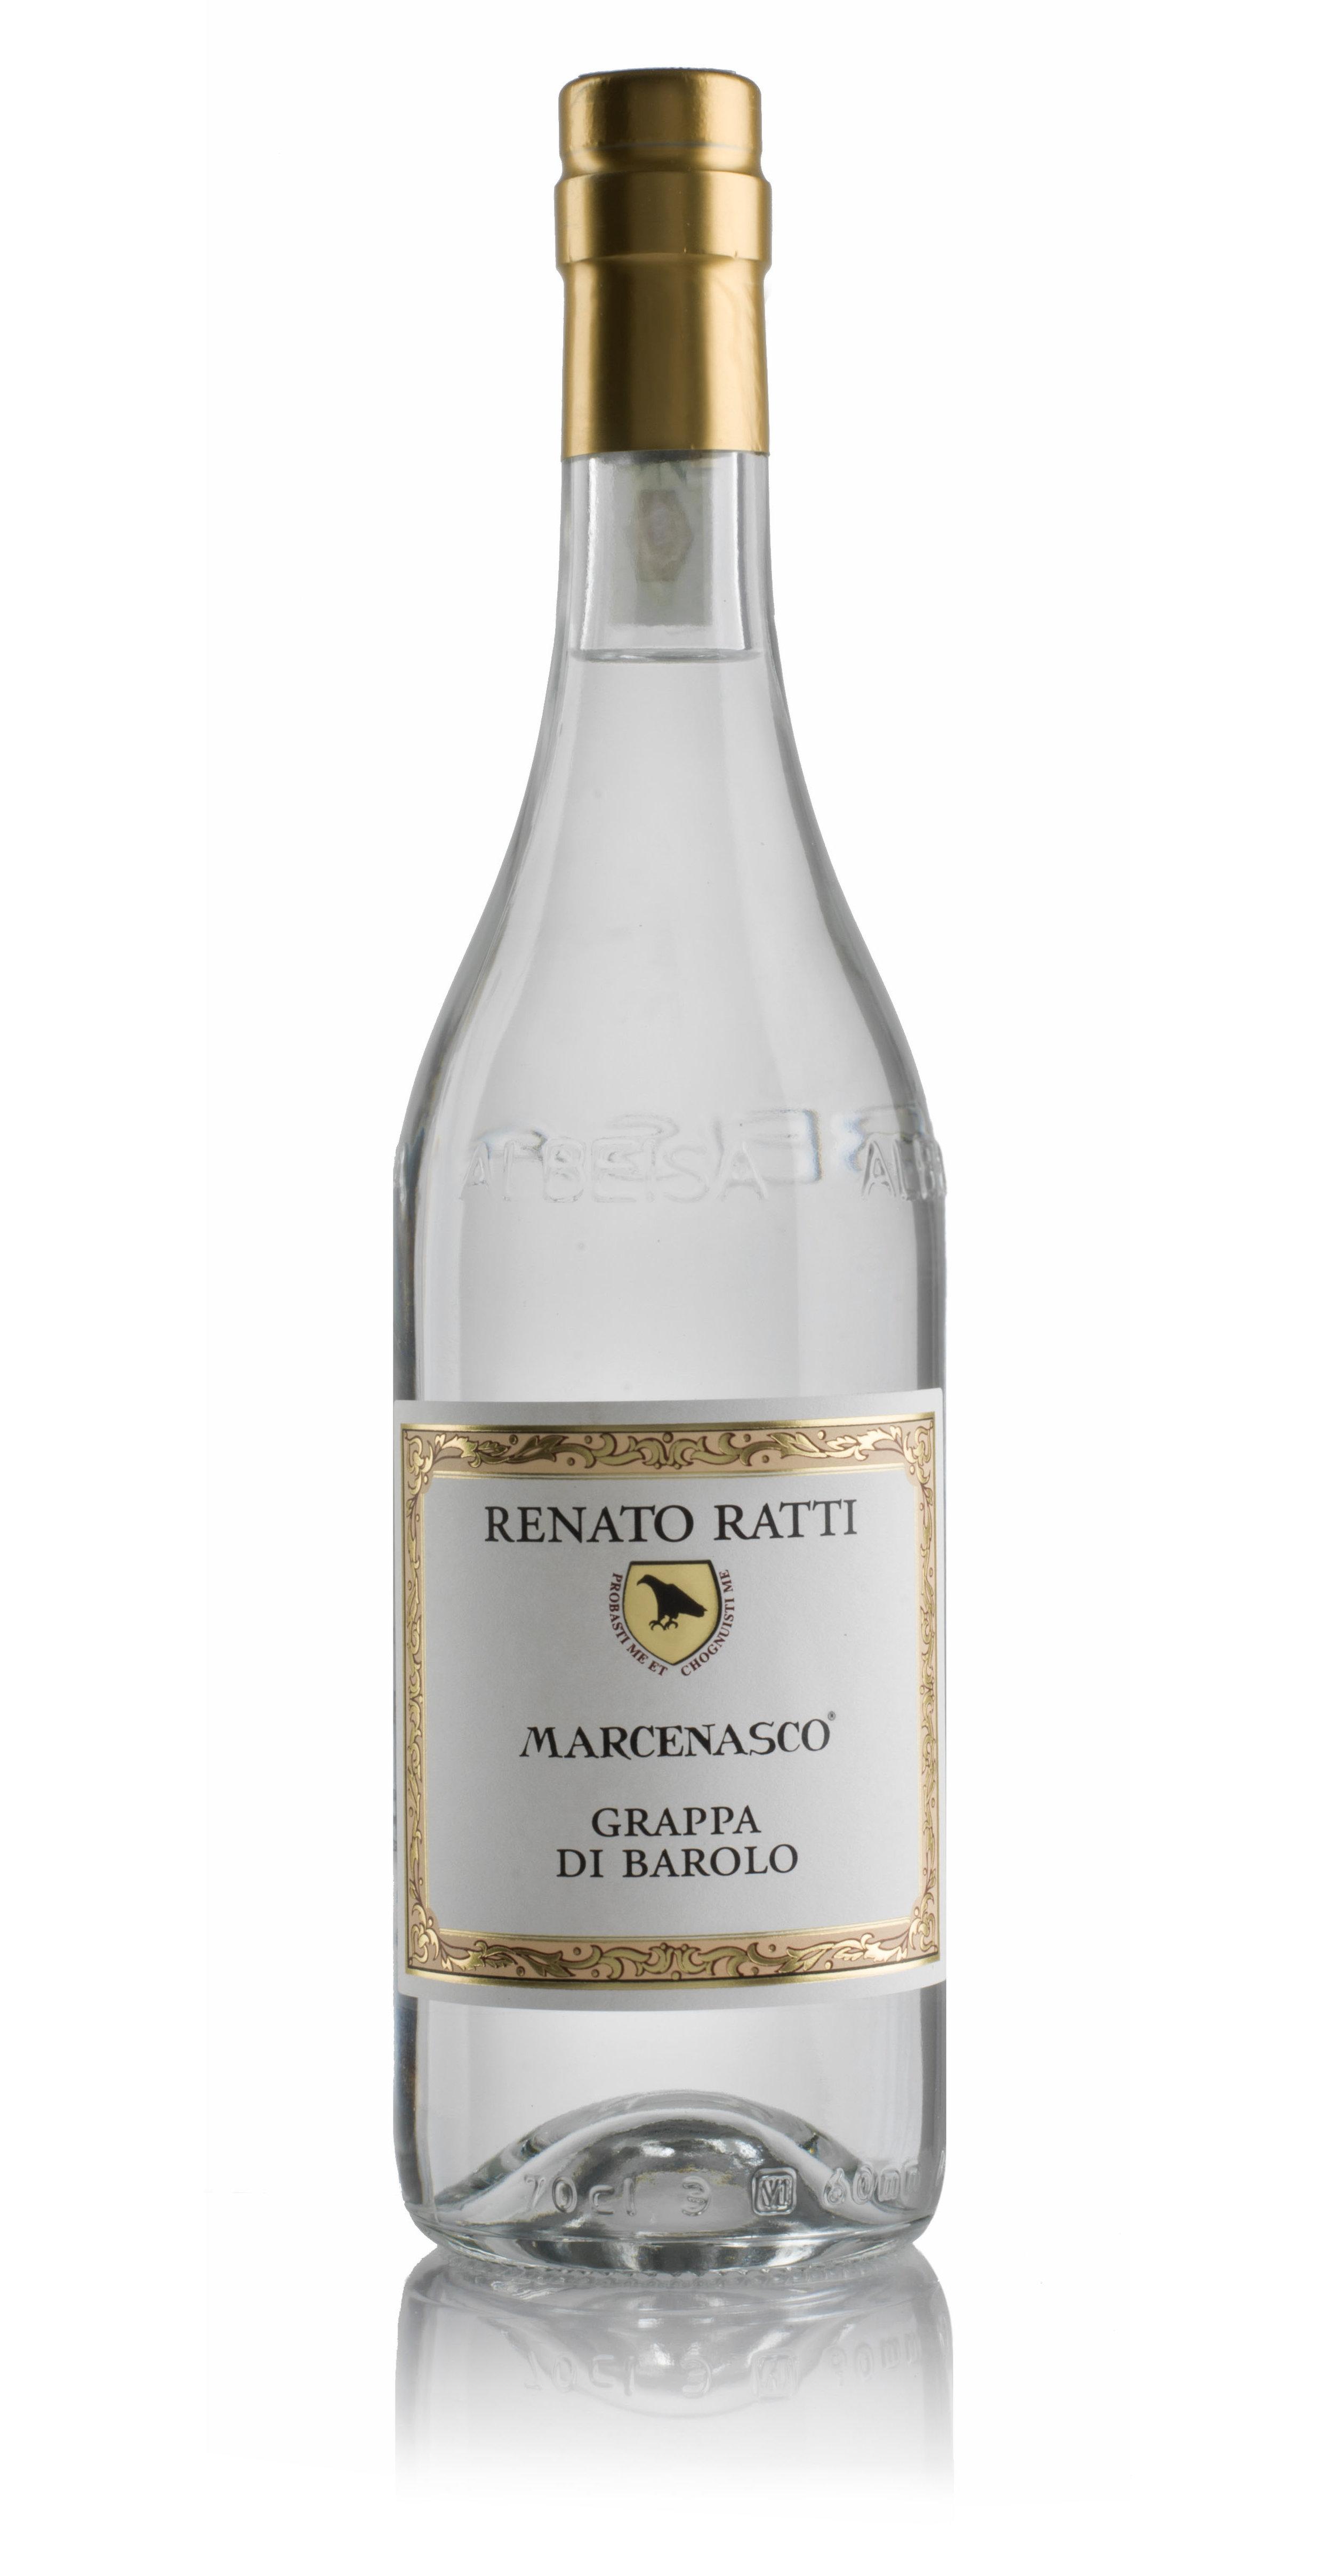 16_grappa-barolo-marcenasco.jpg